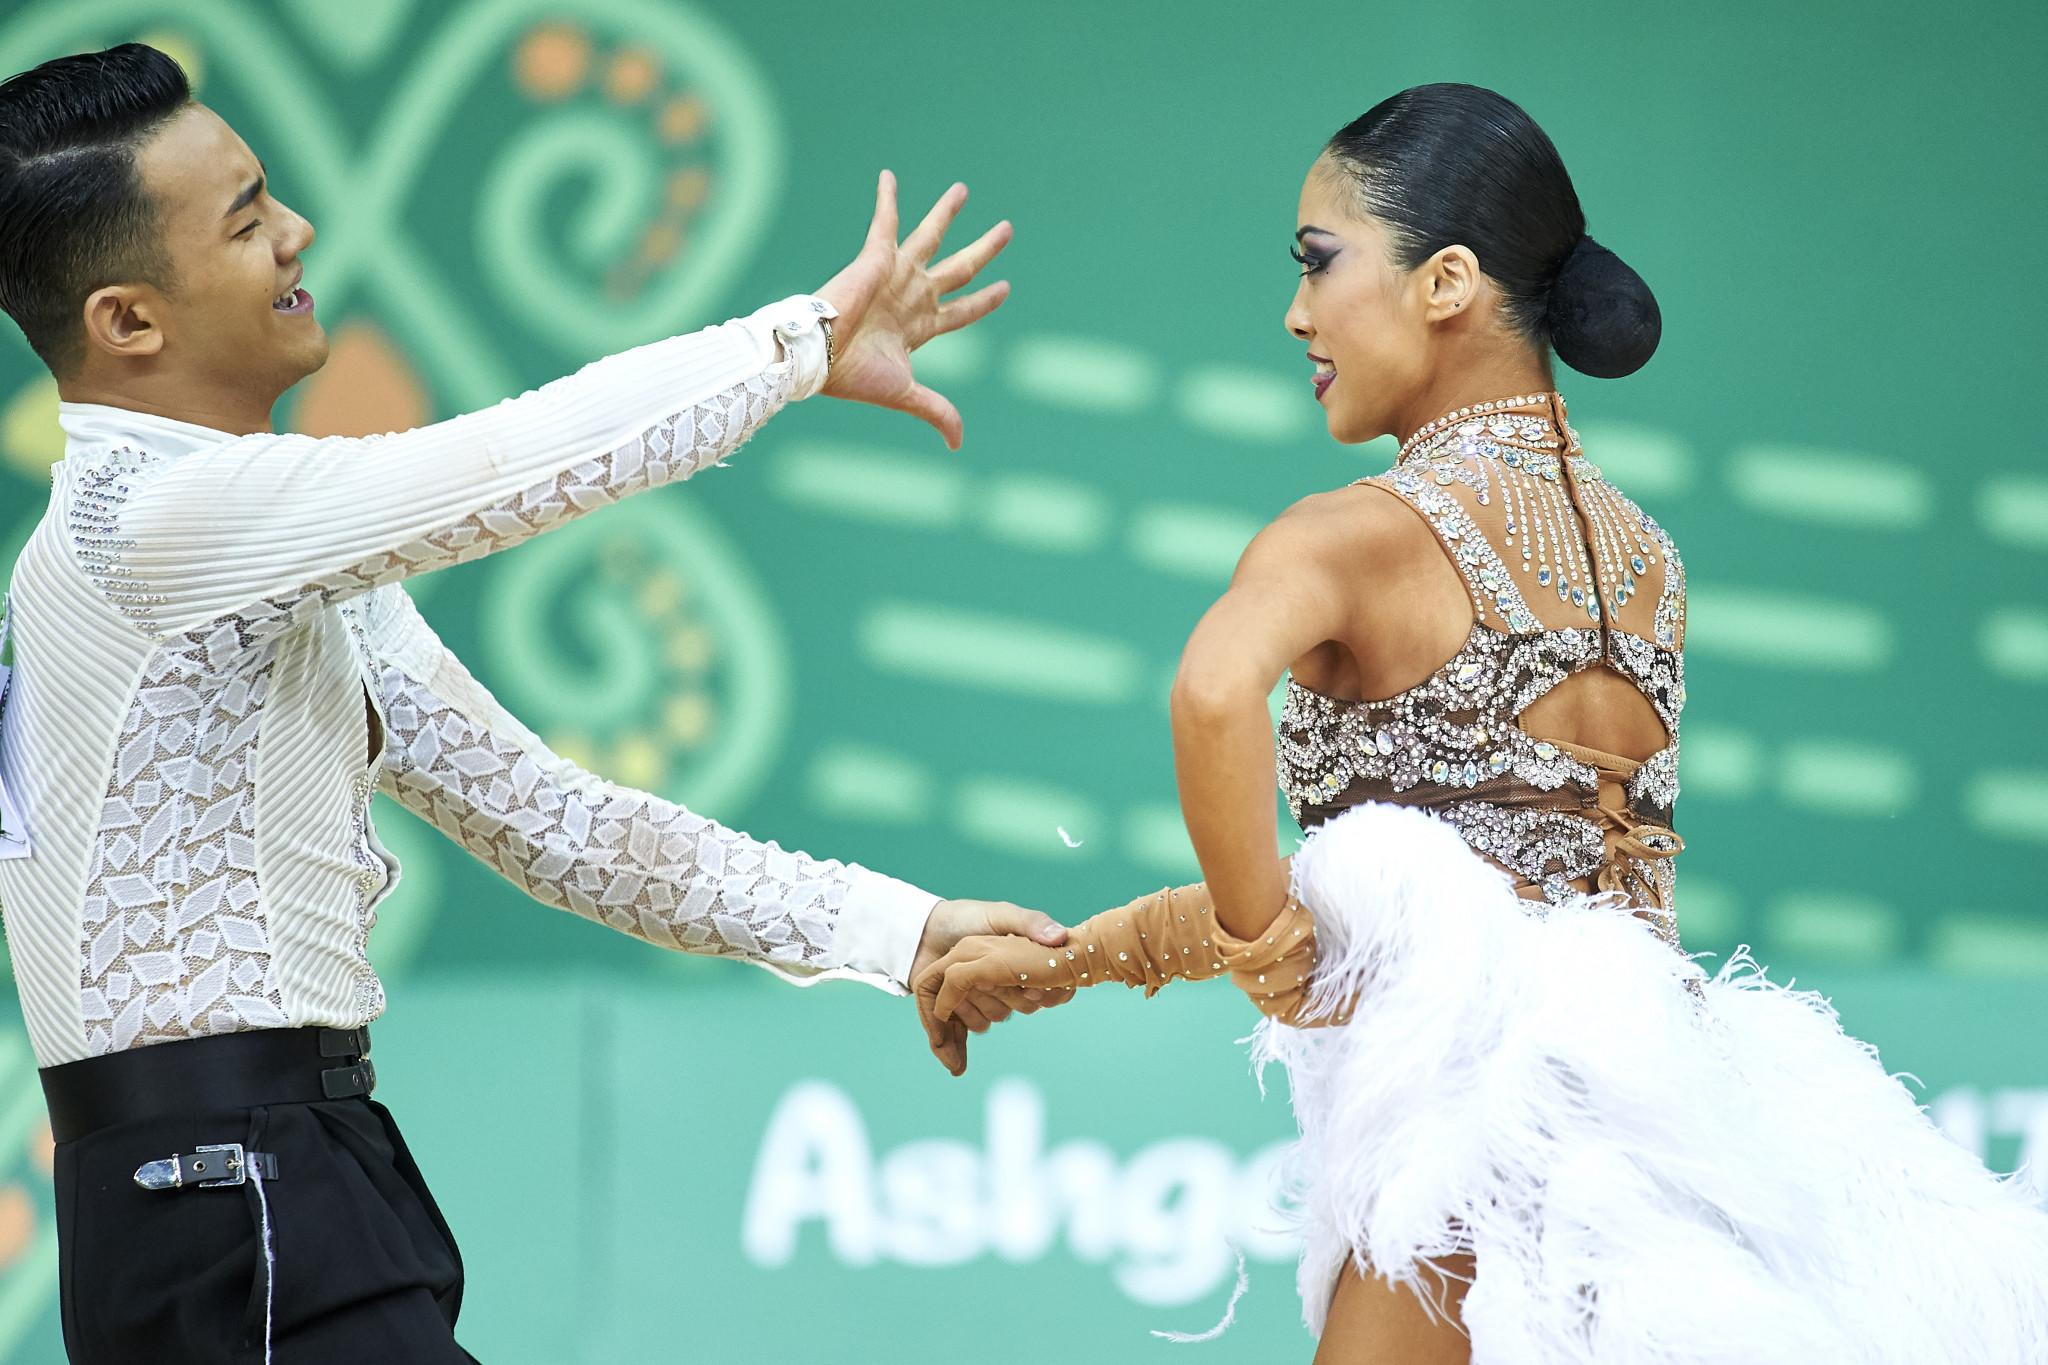 China's Yan Bangbang and Zhu Jing won the paso doble title on the final day of dancesport competition ©Ashgabat 2017/Adam Nurkiewicz/Laurel Photo Services